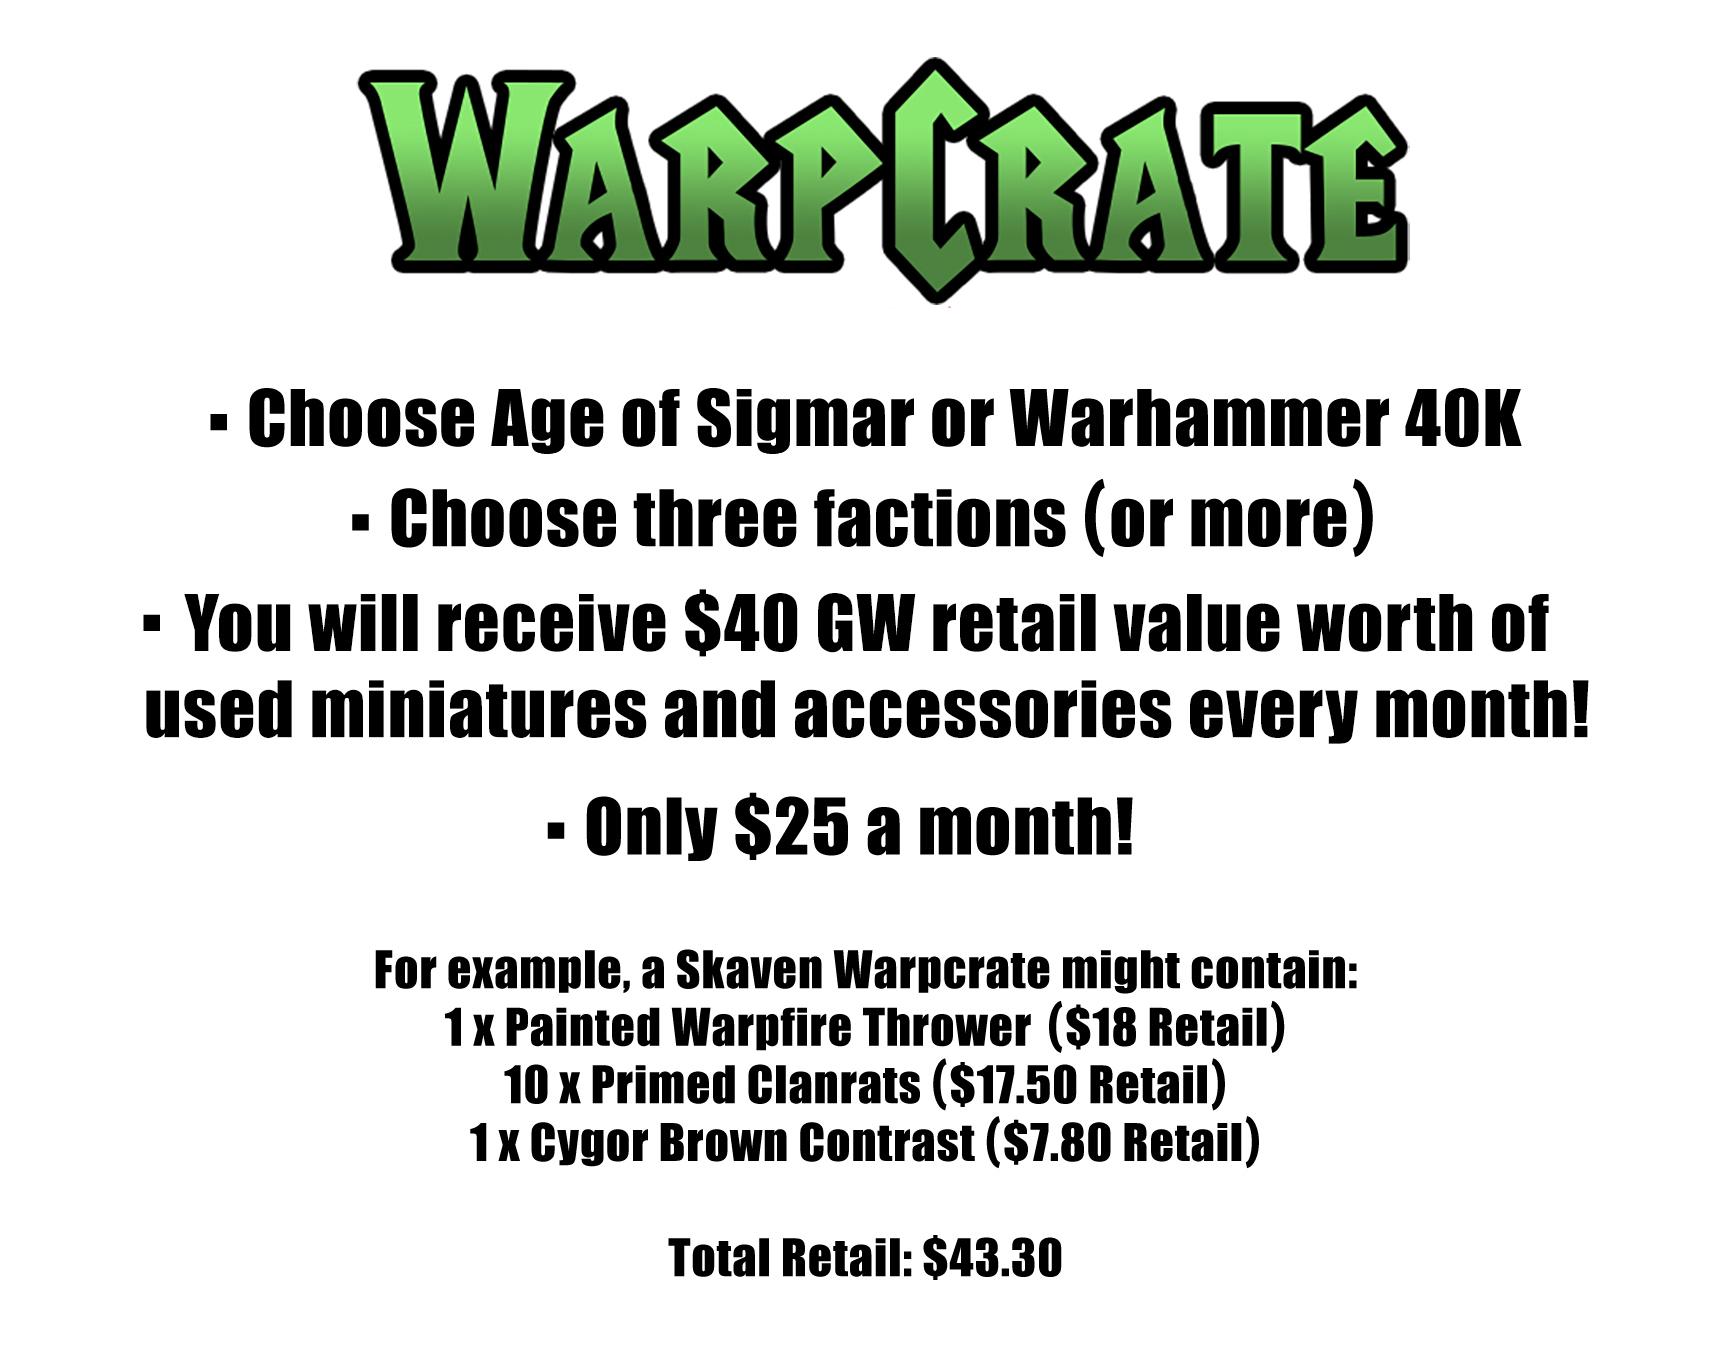 warpcrate-page1.jpg